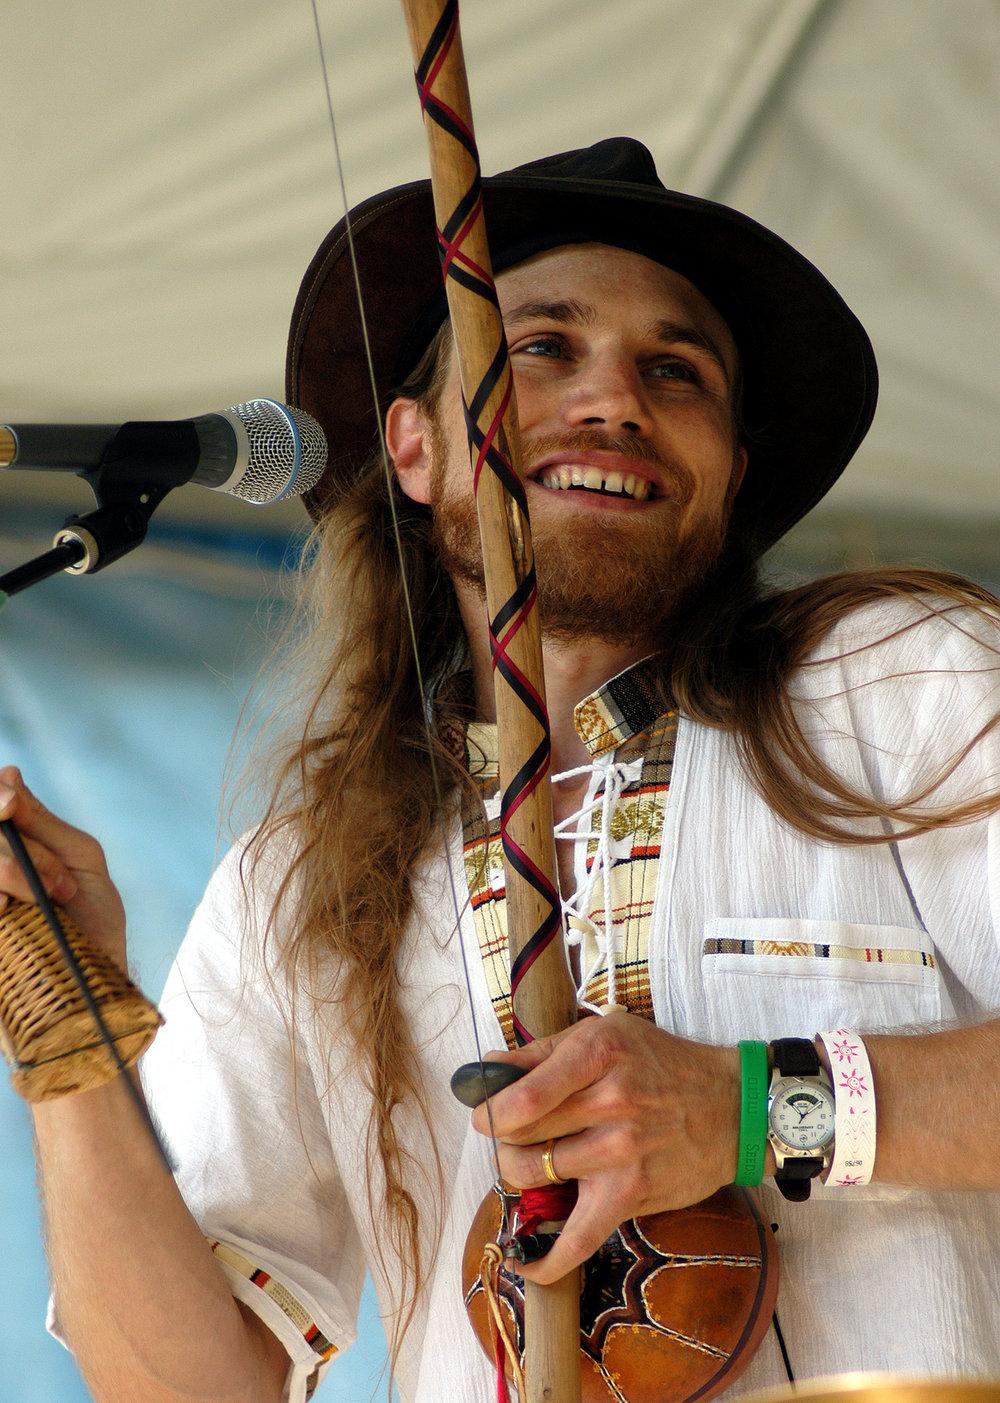 Guy Mendilow Ensemble - Guy Mendilow - Photo by Craig Harris - 300dpi